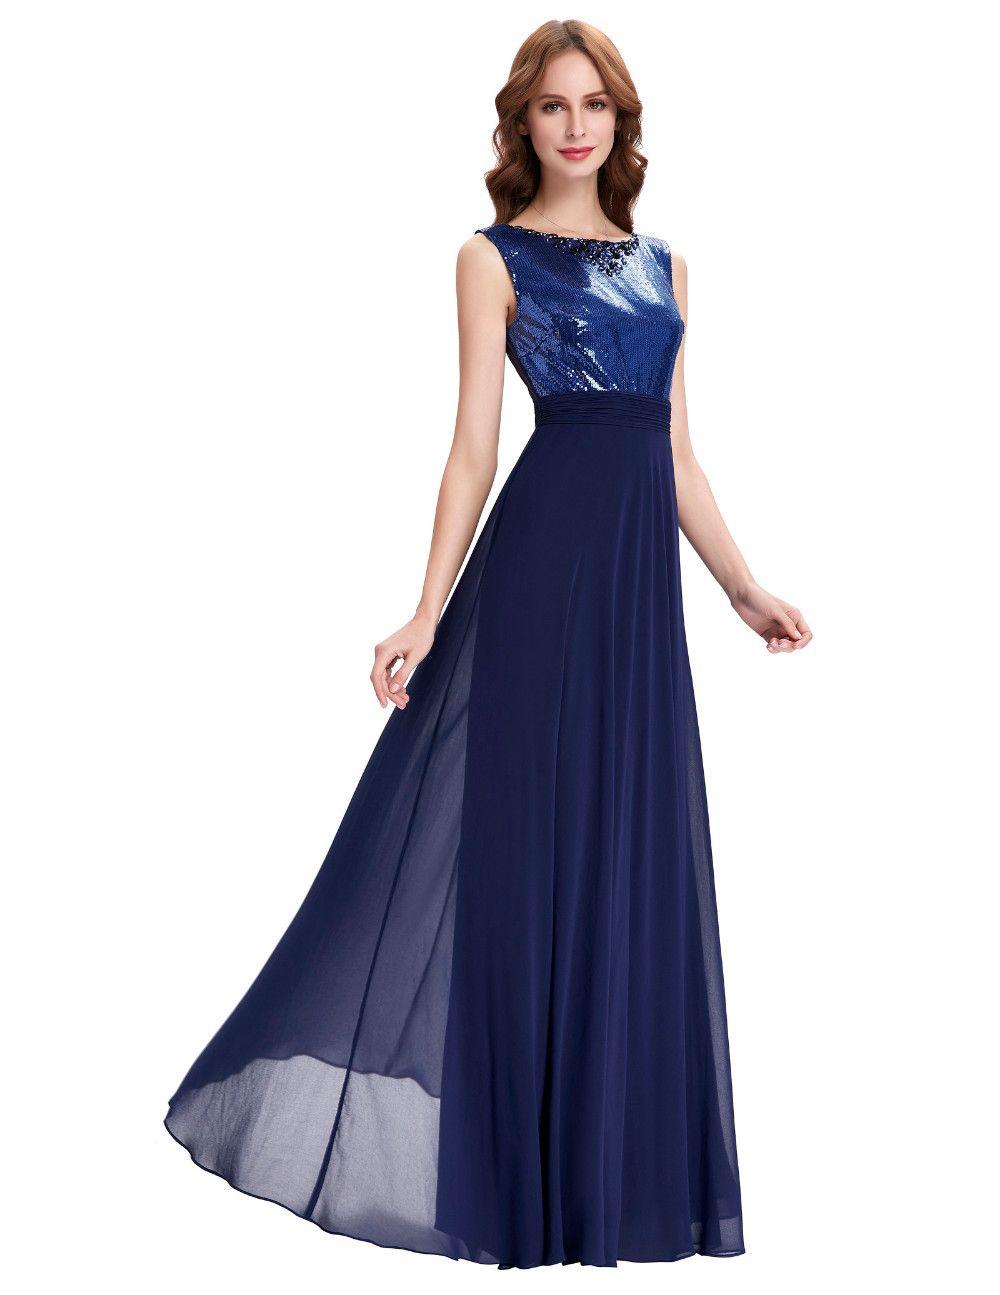 Long Navy Blue Wedding Party Dress | Wedding party dresses, Navy ...